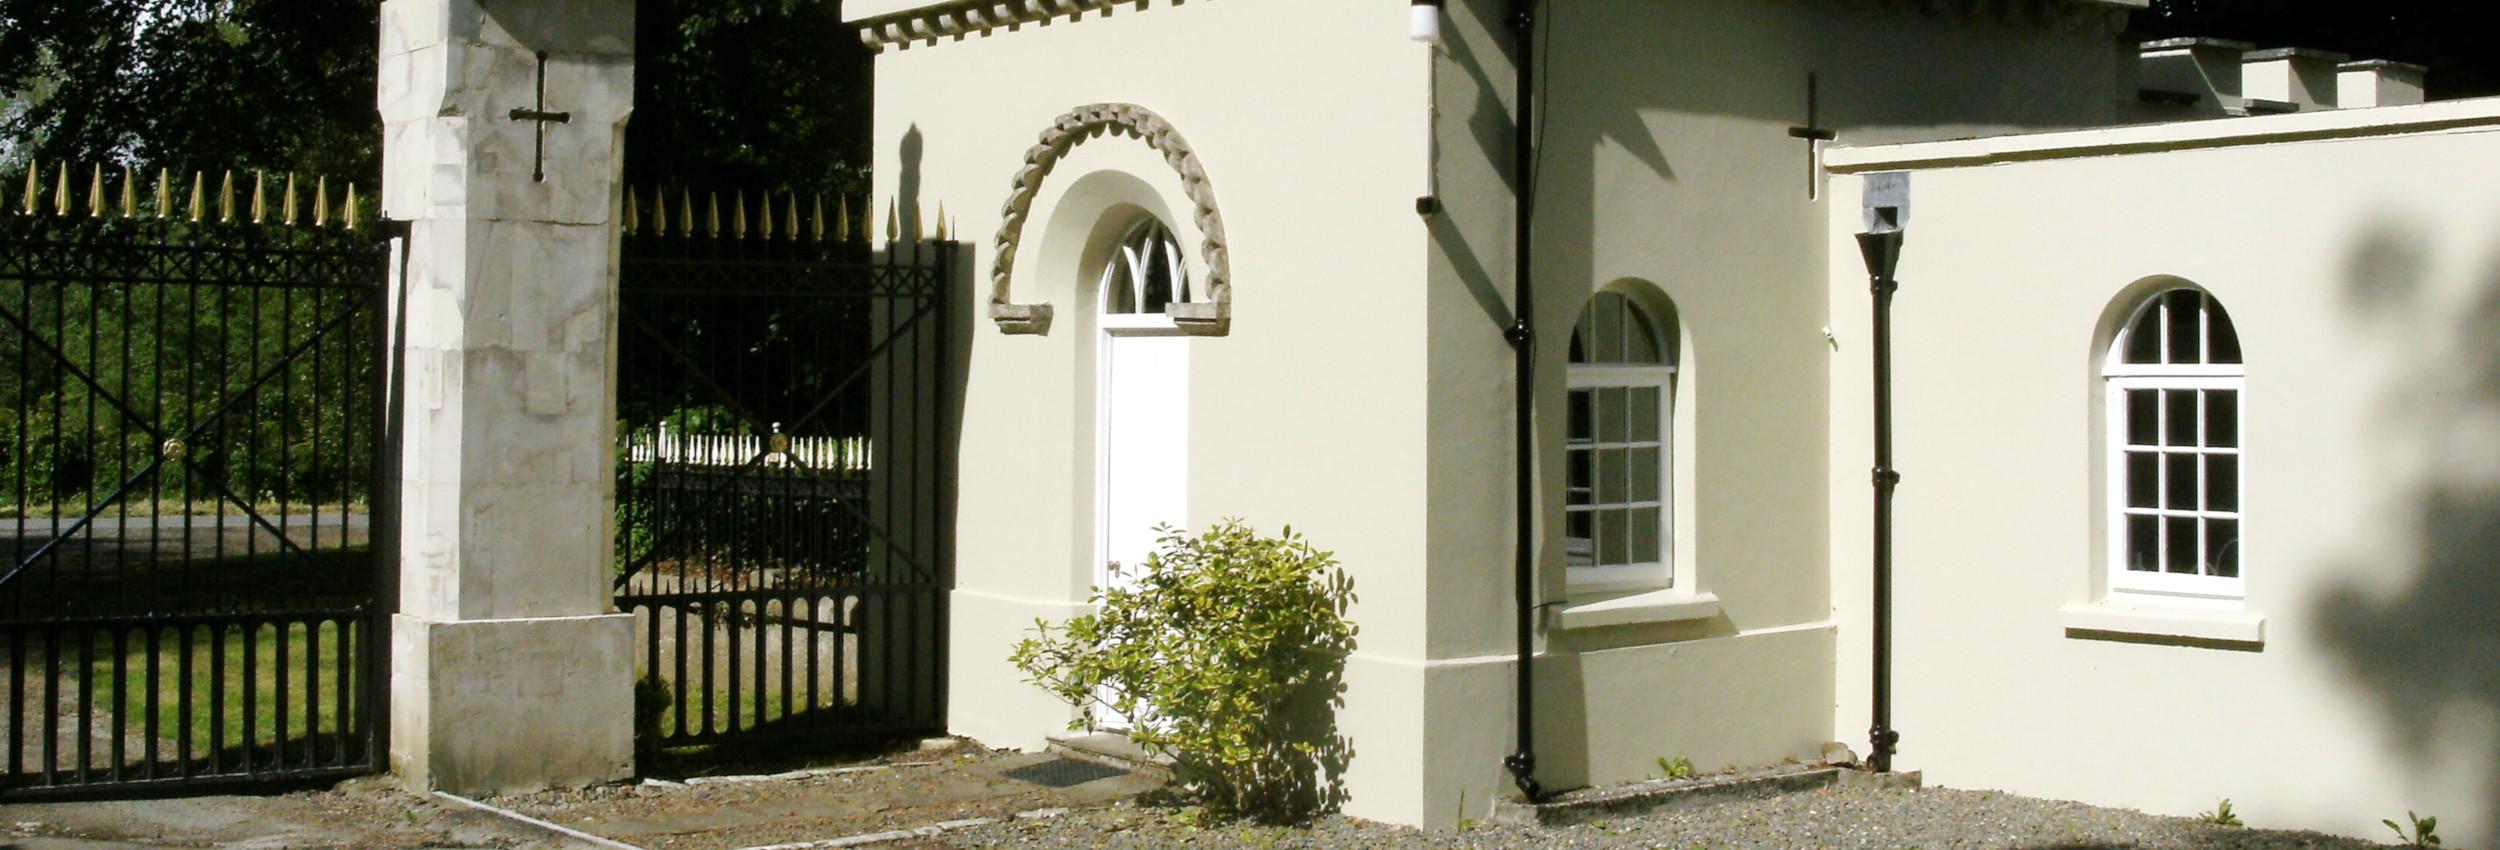 gatehouse-lodge-banner-01